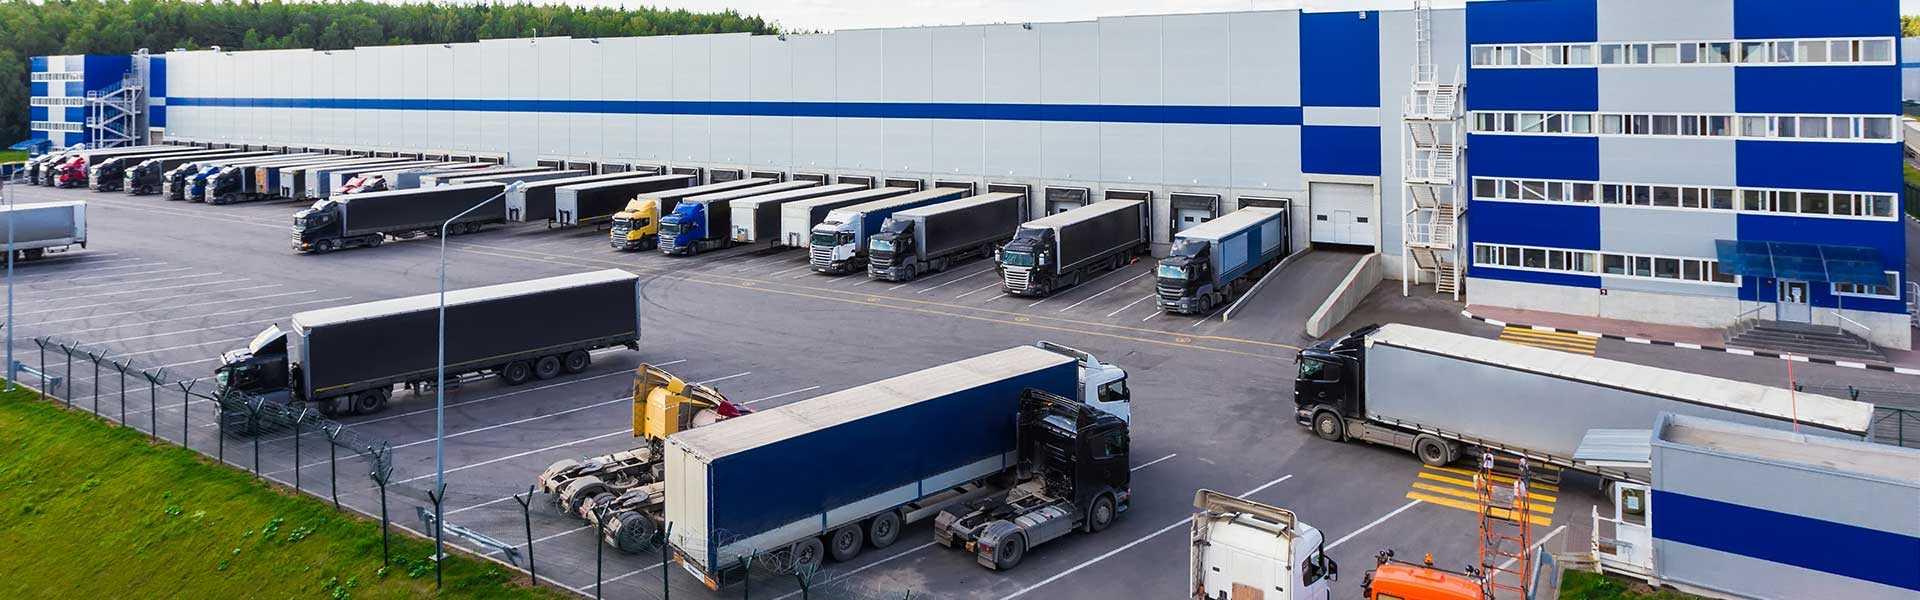 Accruent - Industries - Manufacturing & Distribution - Hero